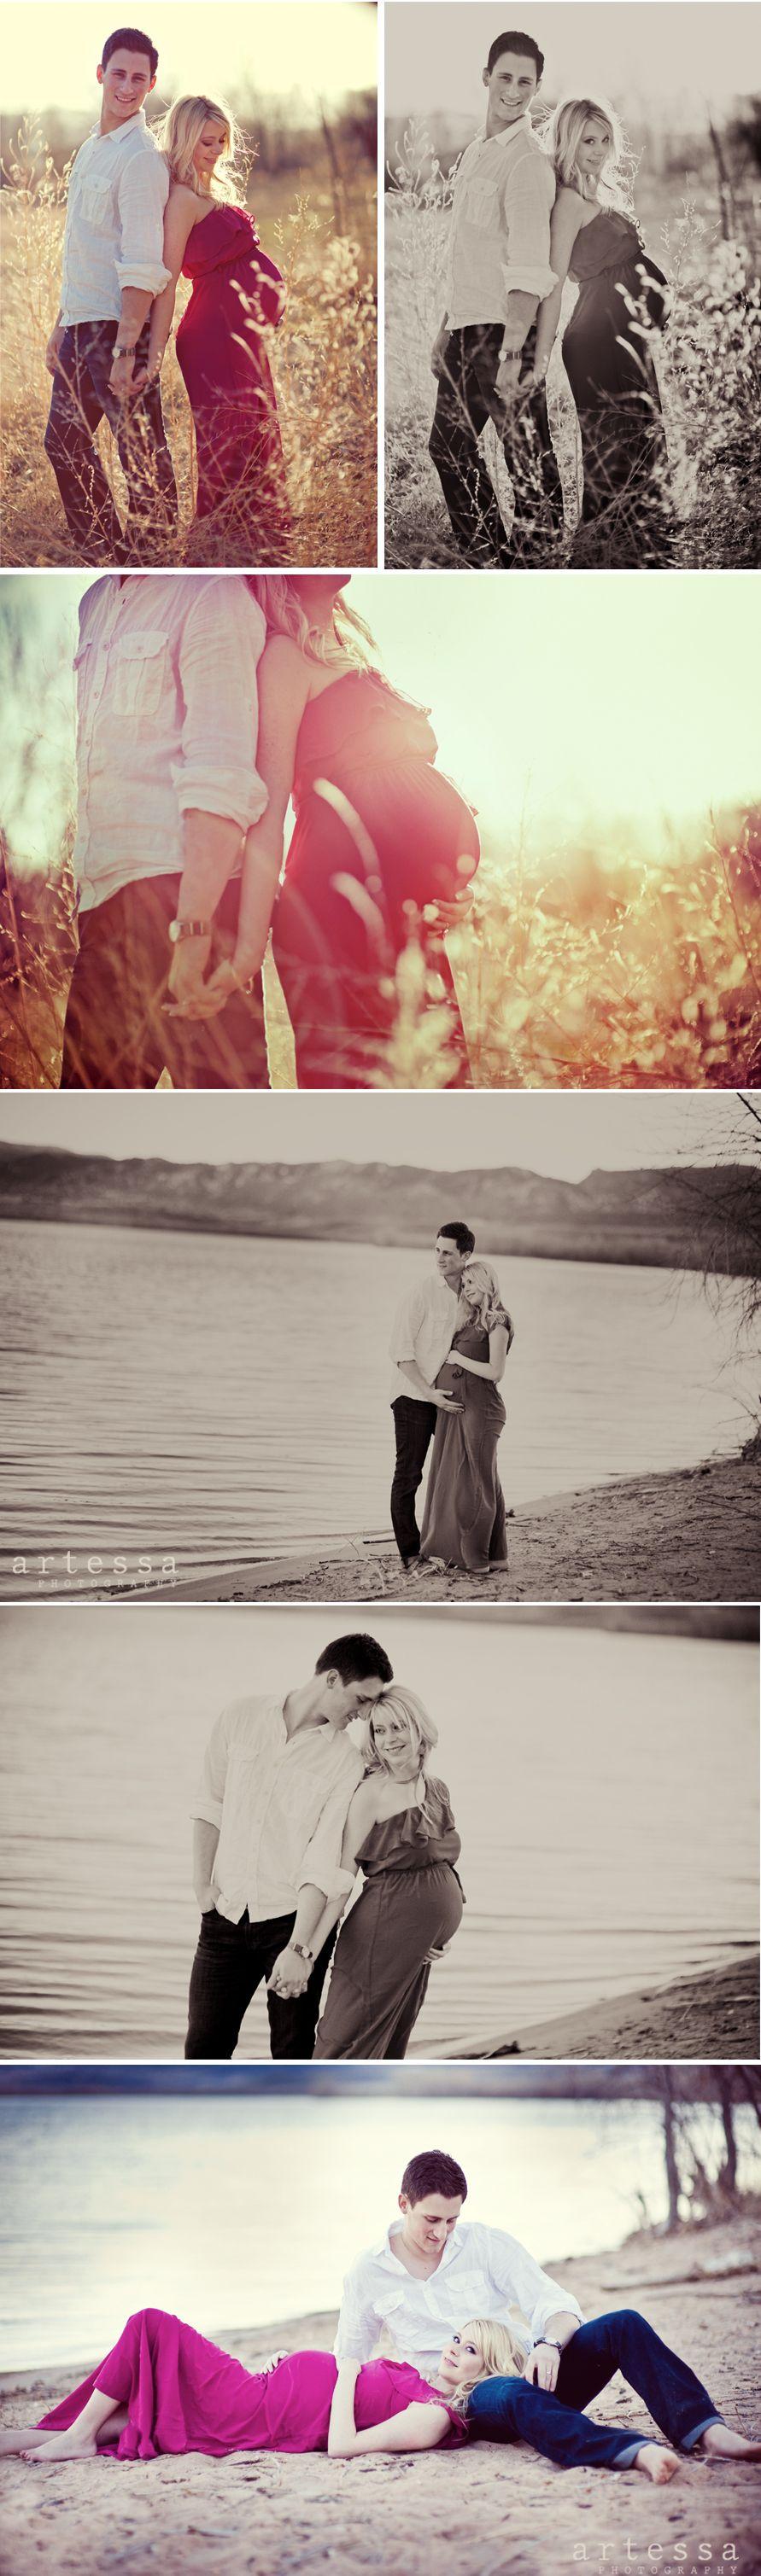 Maternity photo shoot idea these are so romantic looking